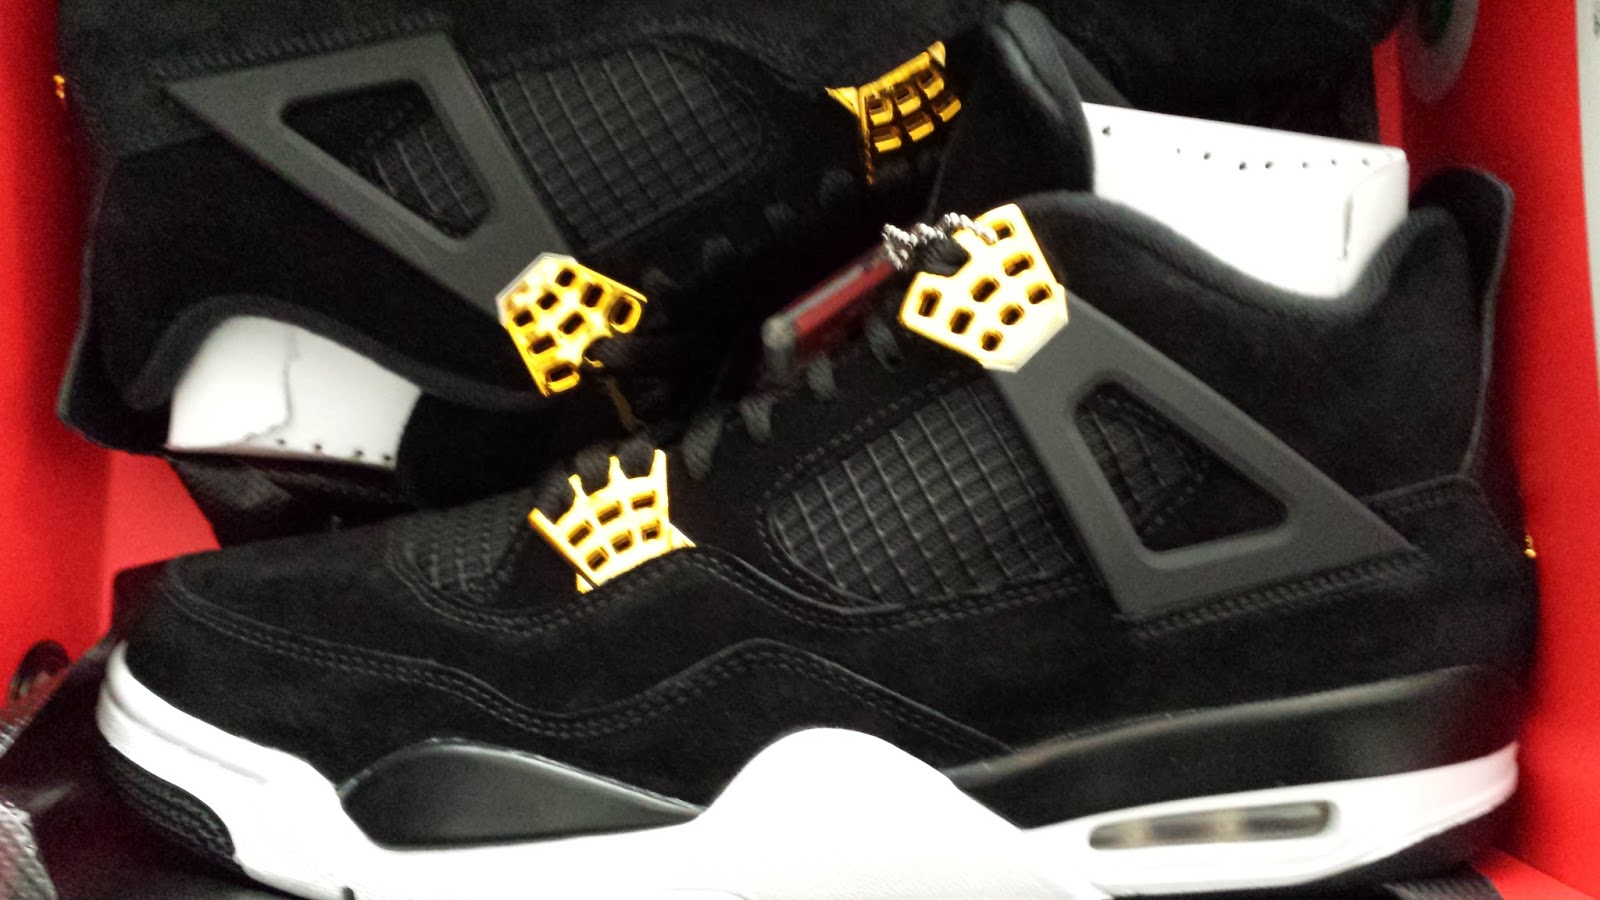 b002c7418623 ... Jordan Retro now available at Everest Style Mart Cebu Philippines ~  Everest Style Mart Shoe Store  Brand New ...